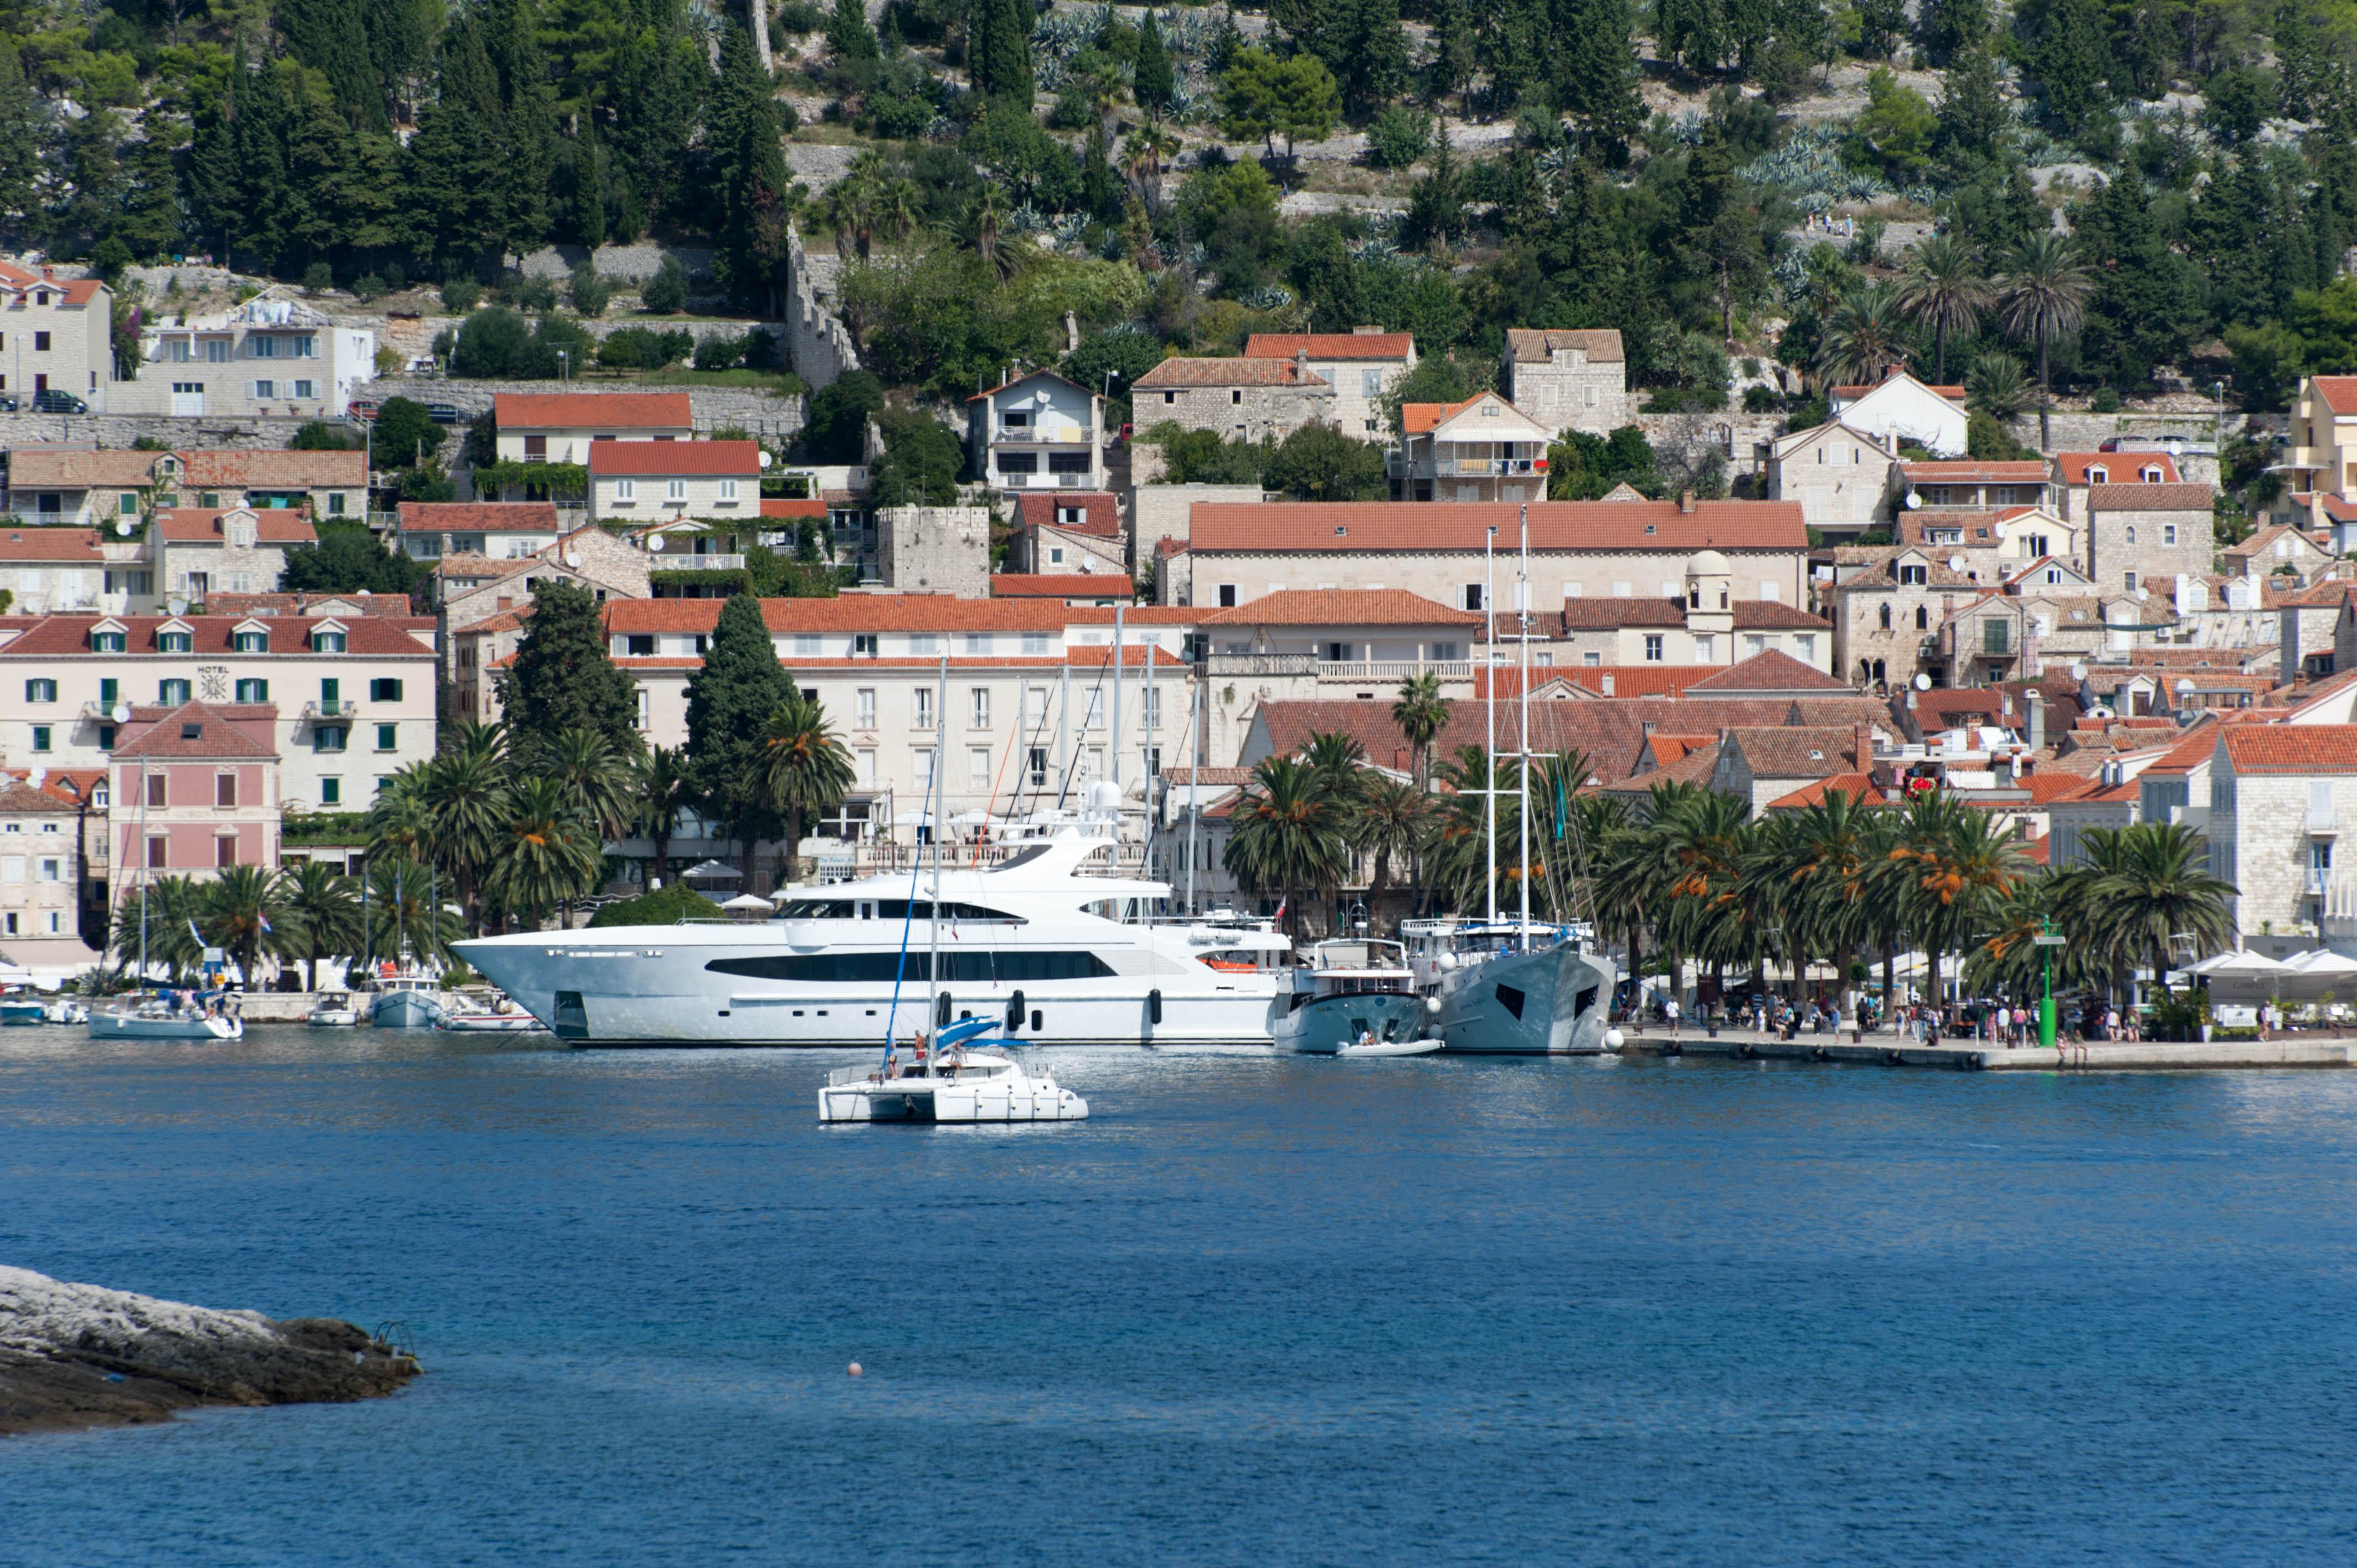 9853-Hvar (Dalmatie centrale)